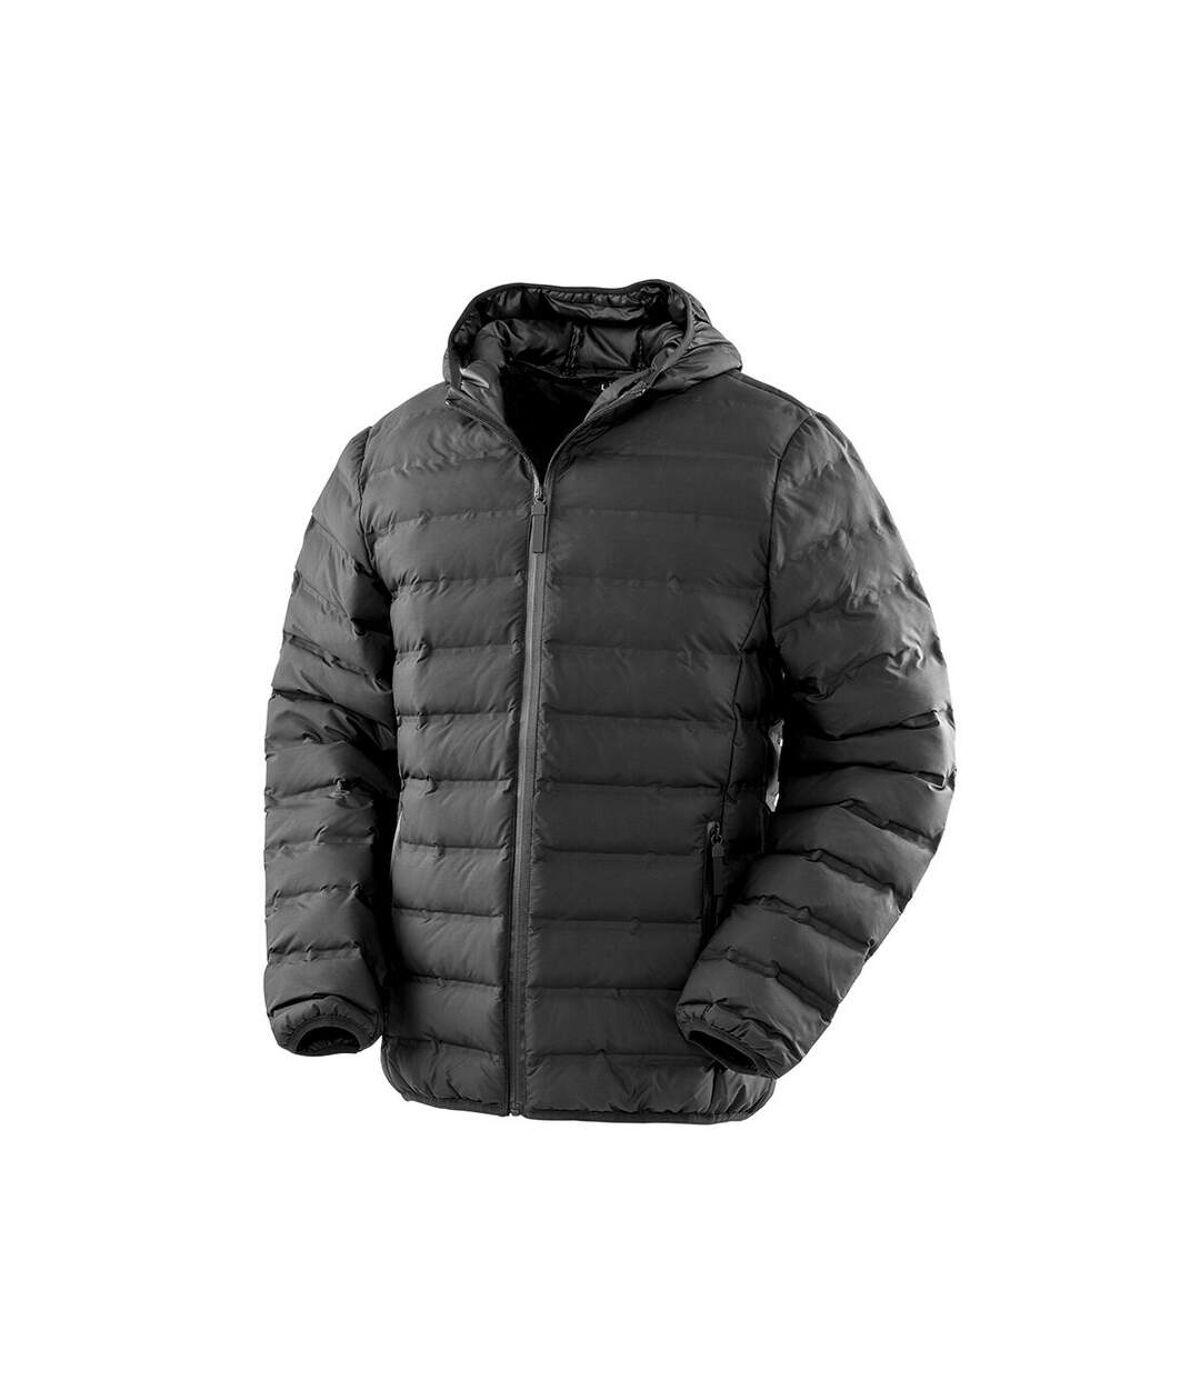 Result Urban Mens Hooded Ultrasonic Jacket (Black) - UTPC3679